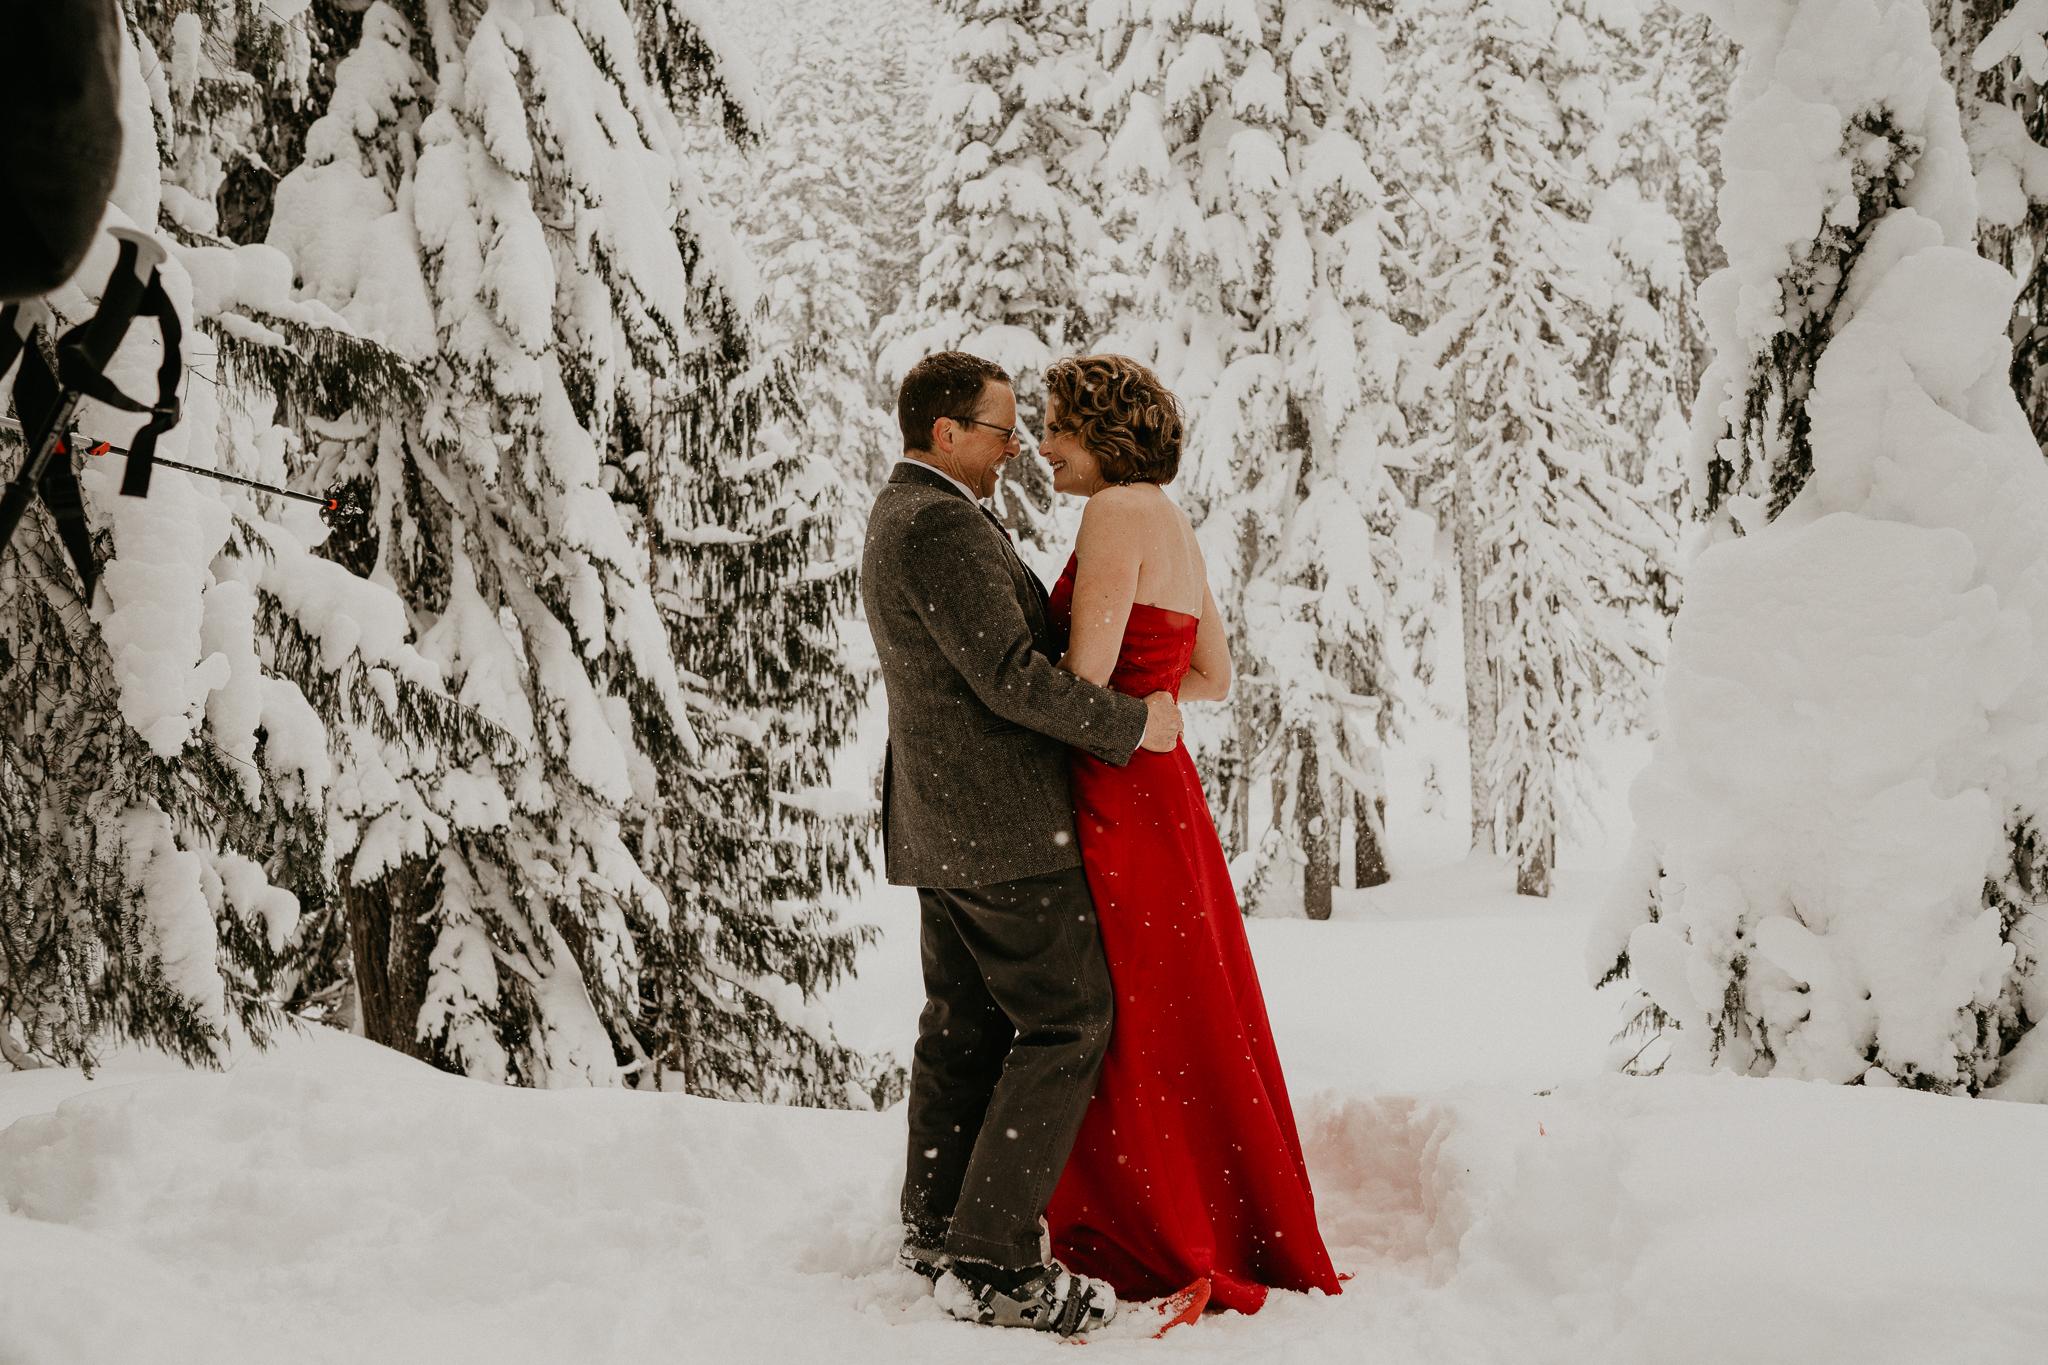 Mount-Rainier-Snow-Winter-Elopement-Adventure-Photographer2-67.jpg